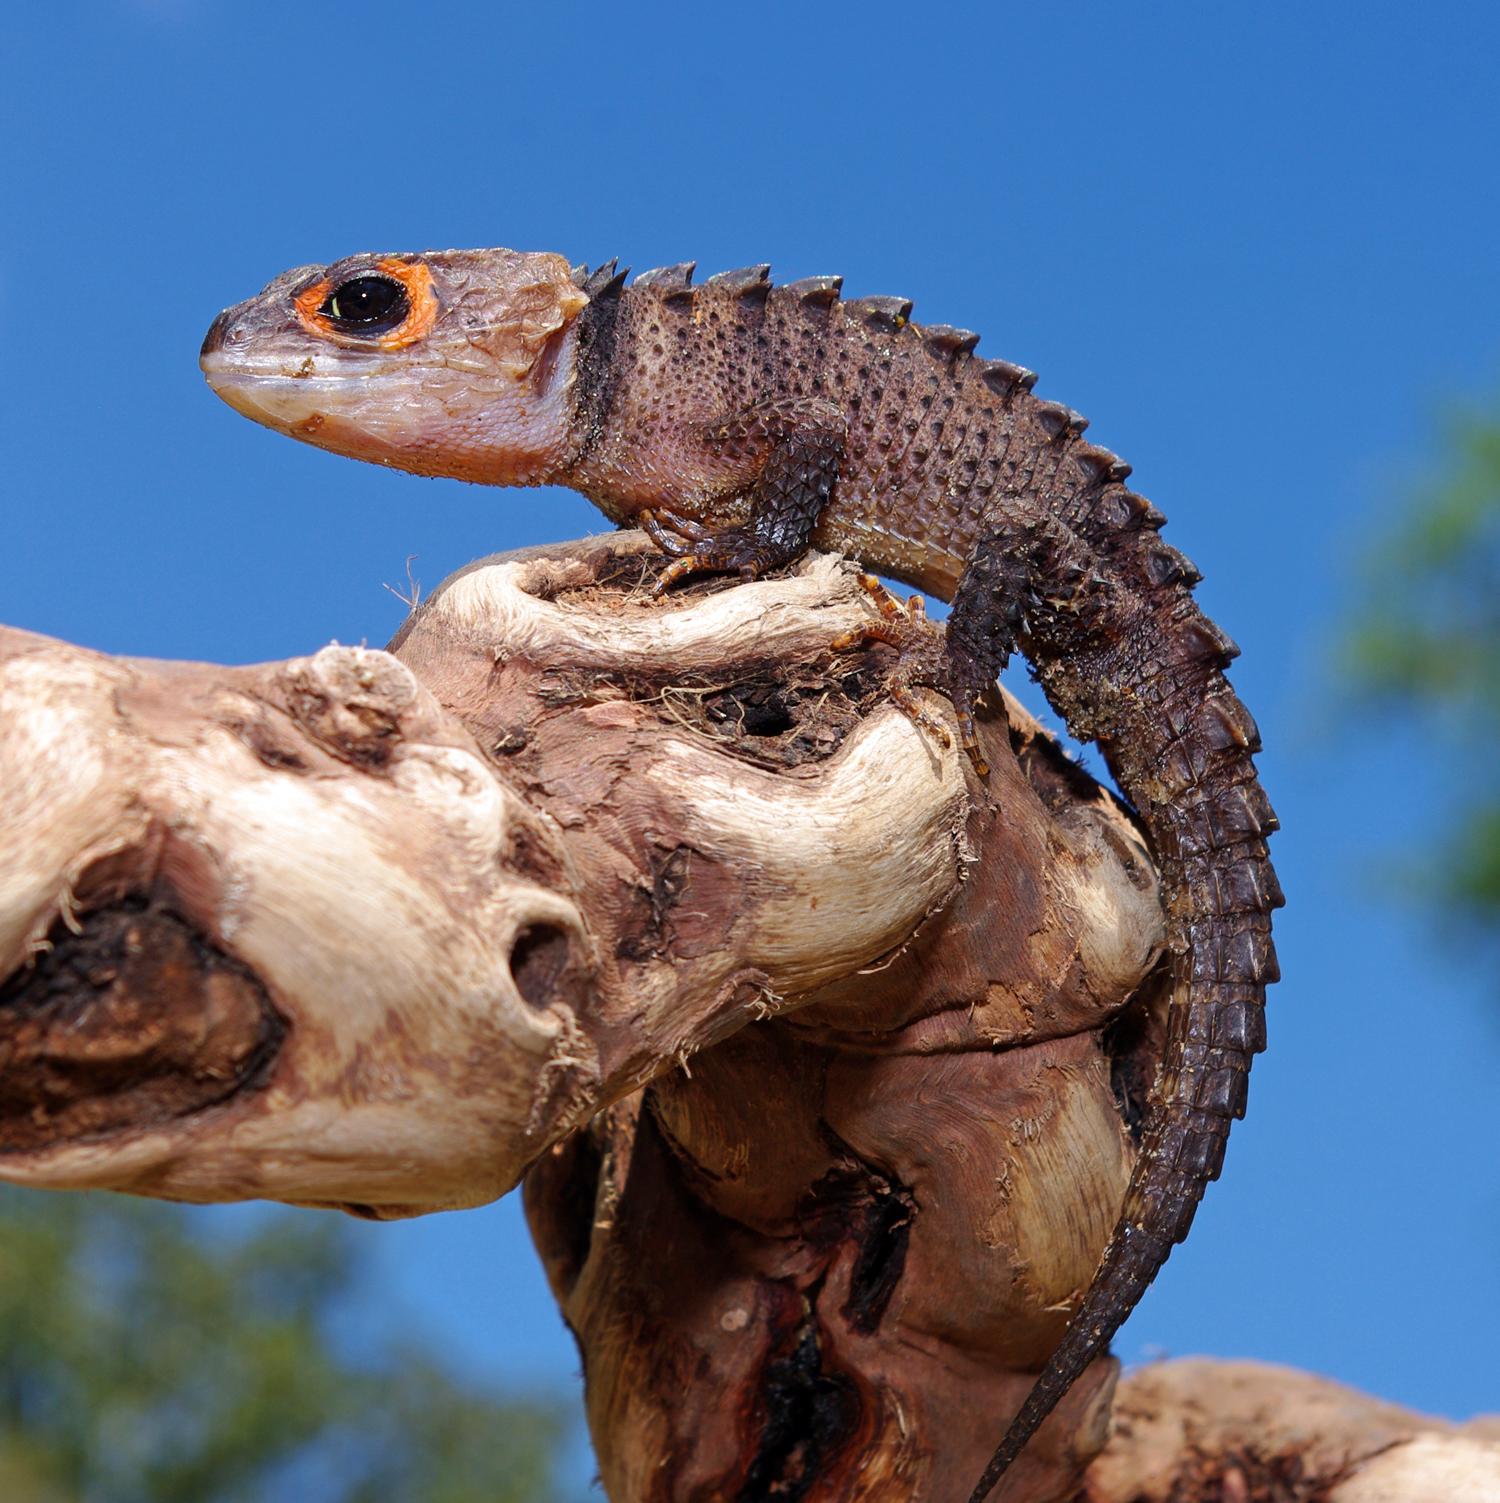 Red-eyed crocodile skink - Wikipedia